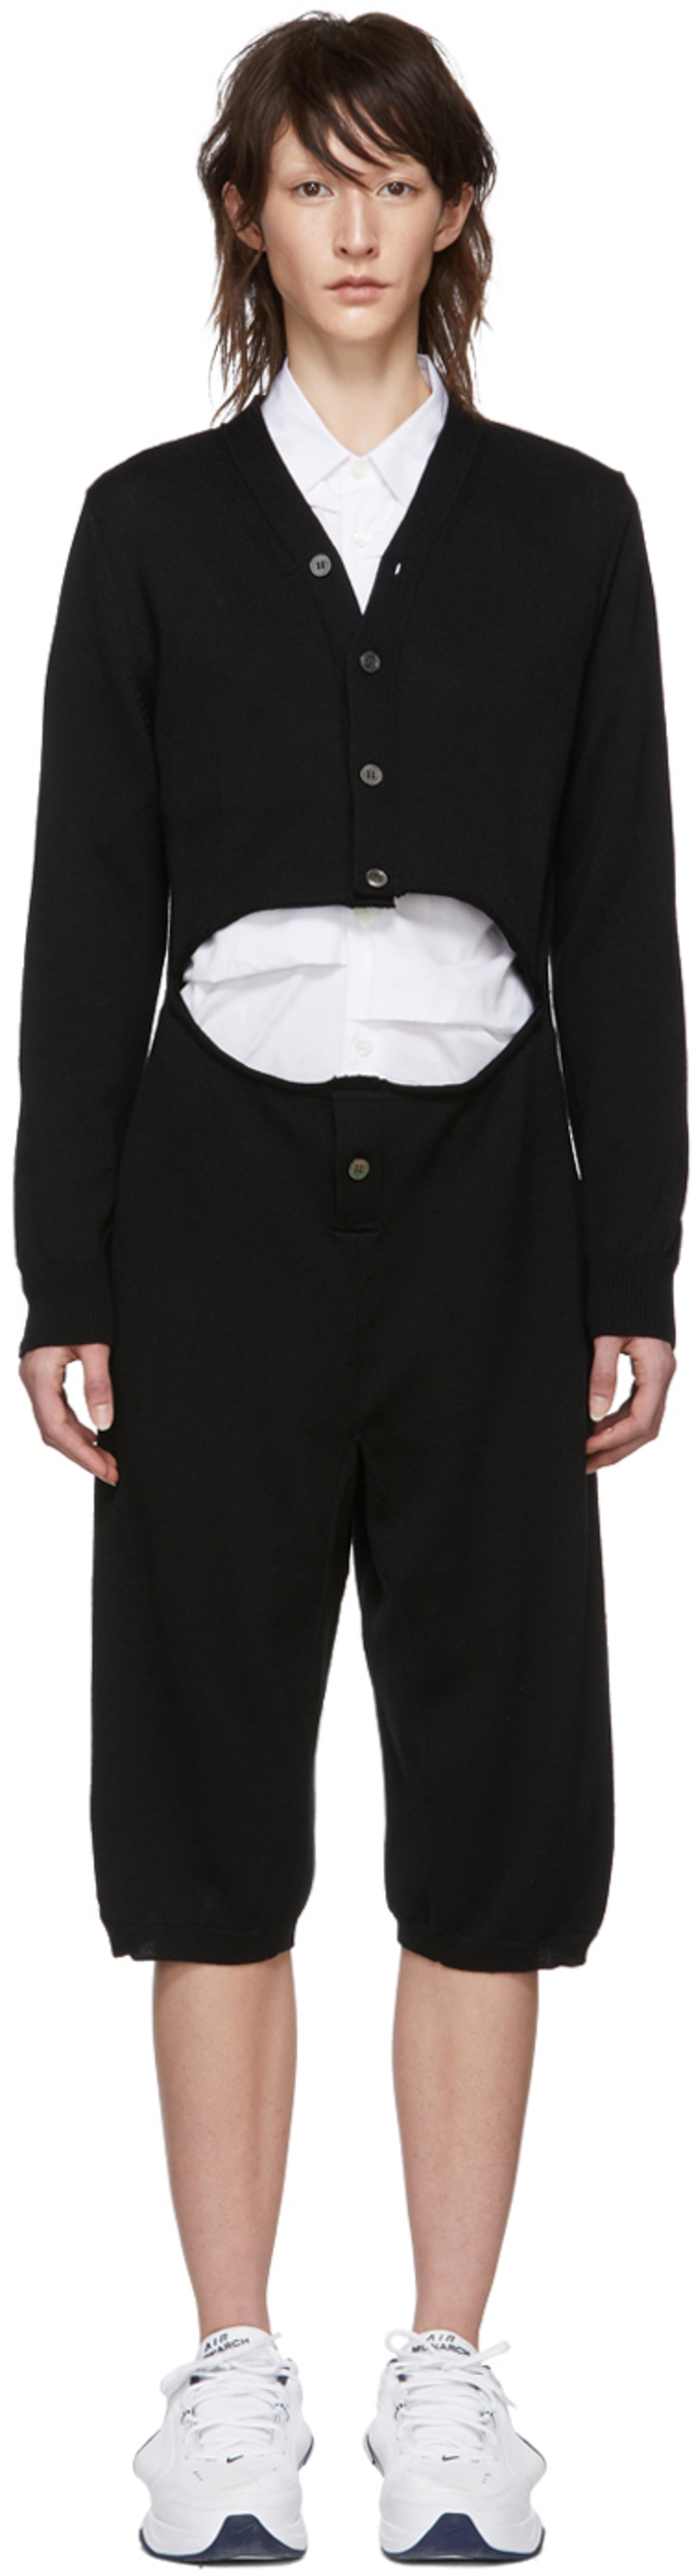 619fac9d588 Designer jumpsuits for Women